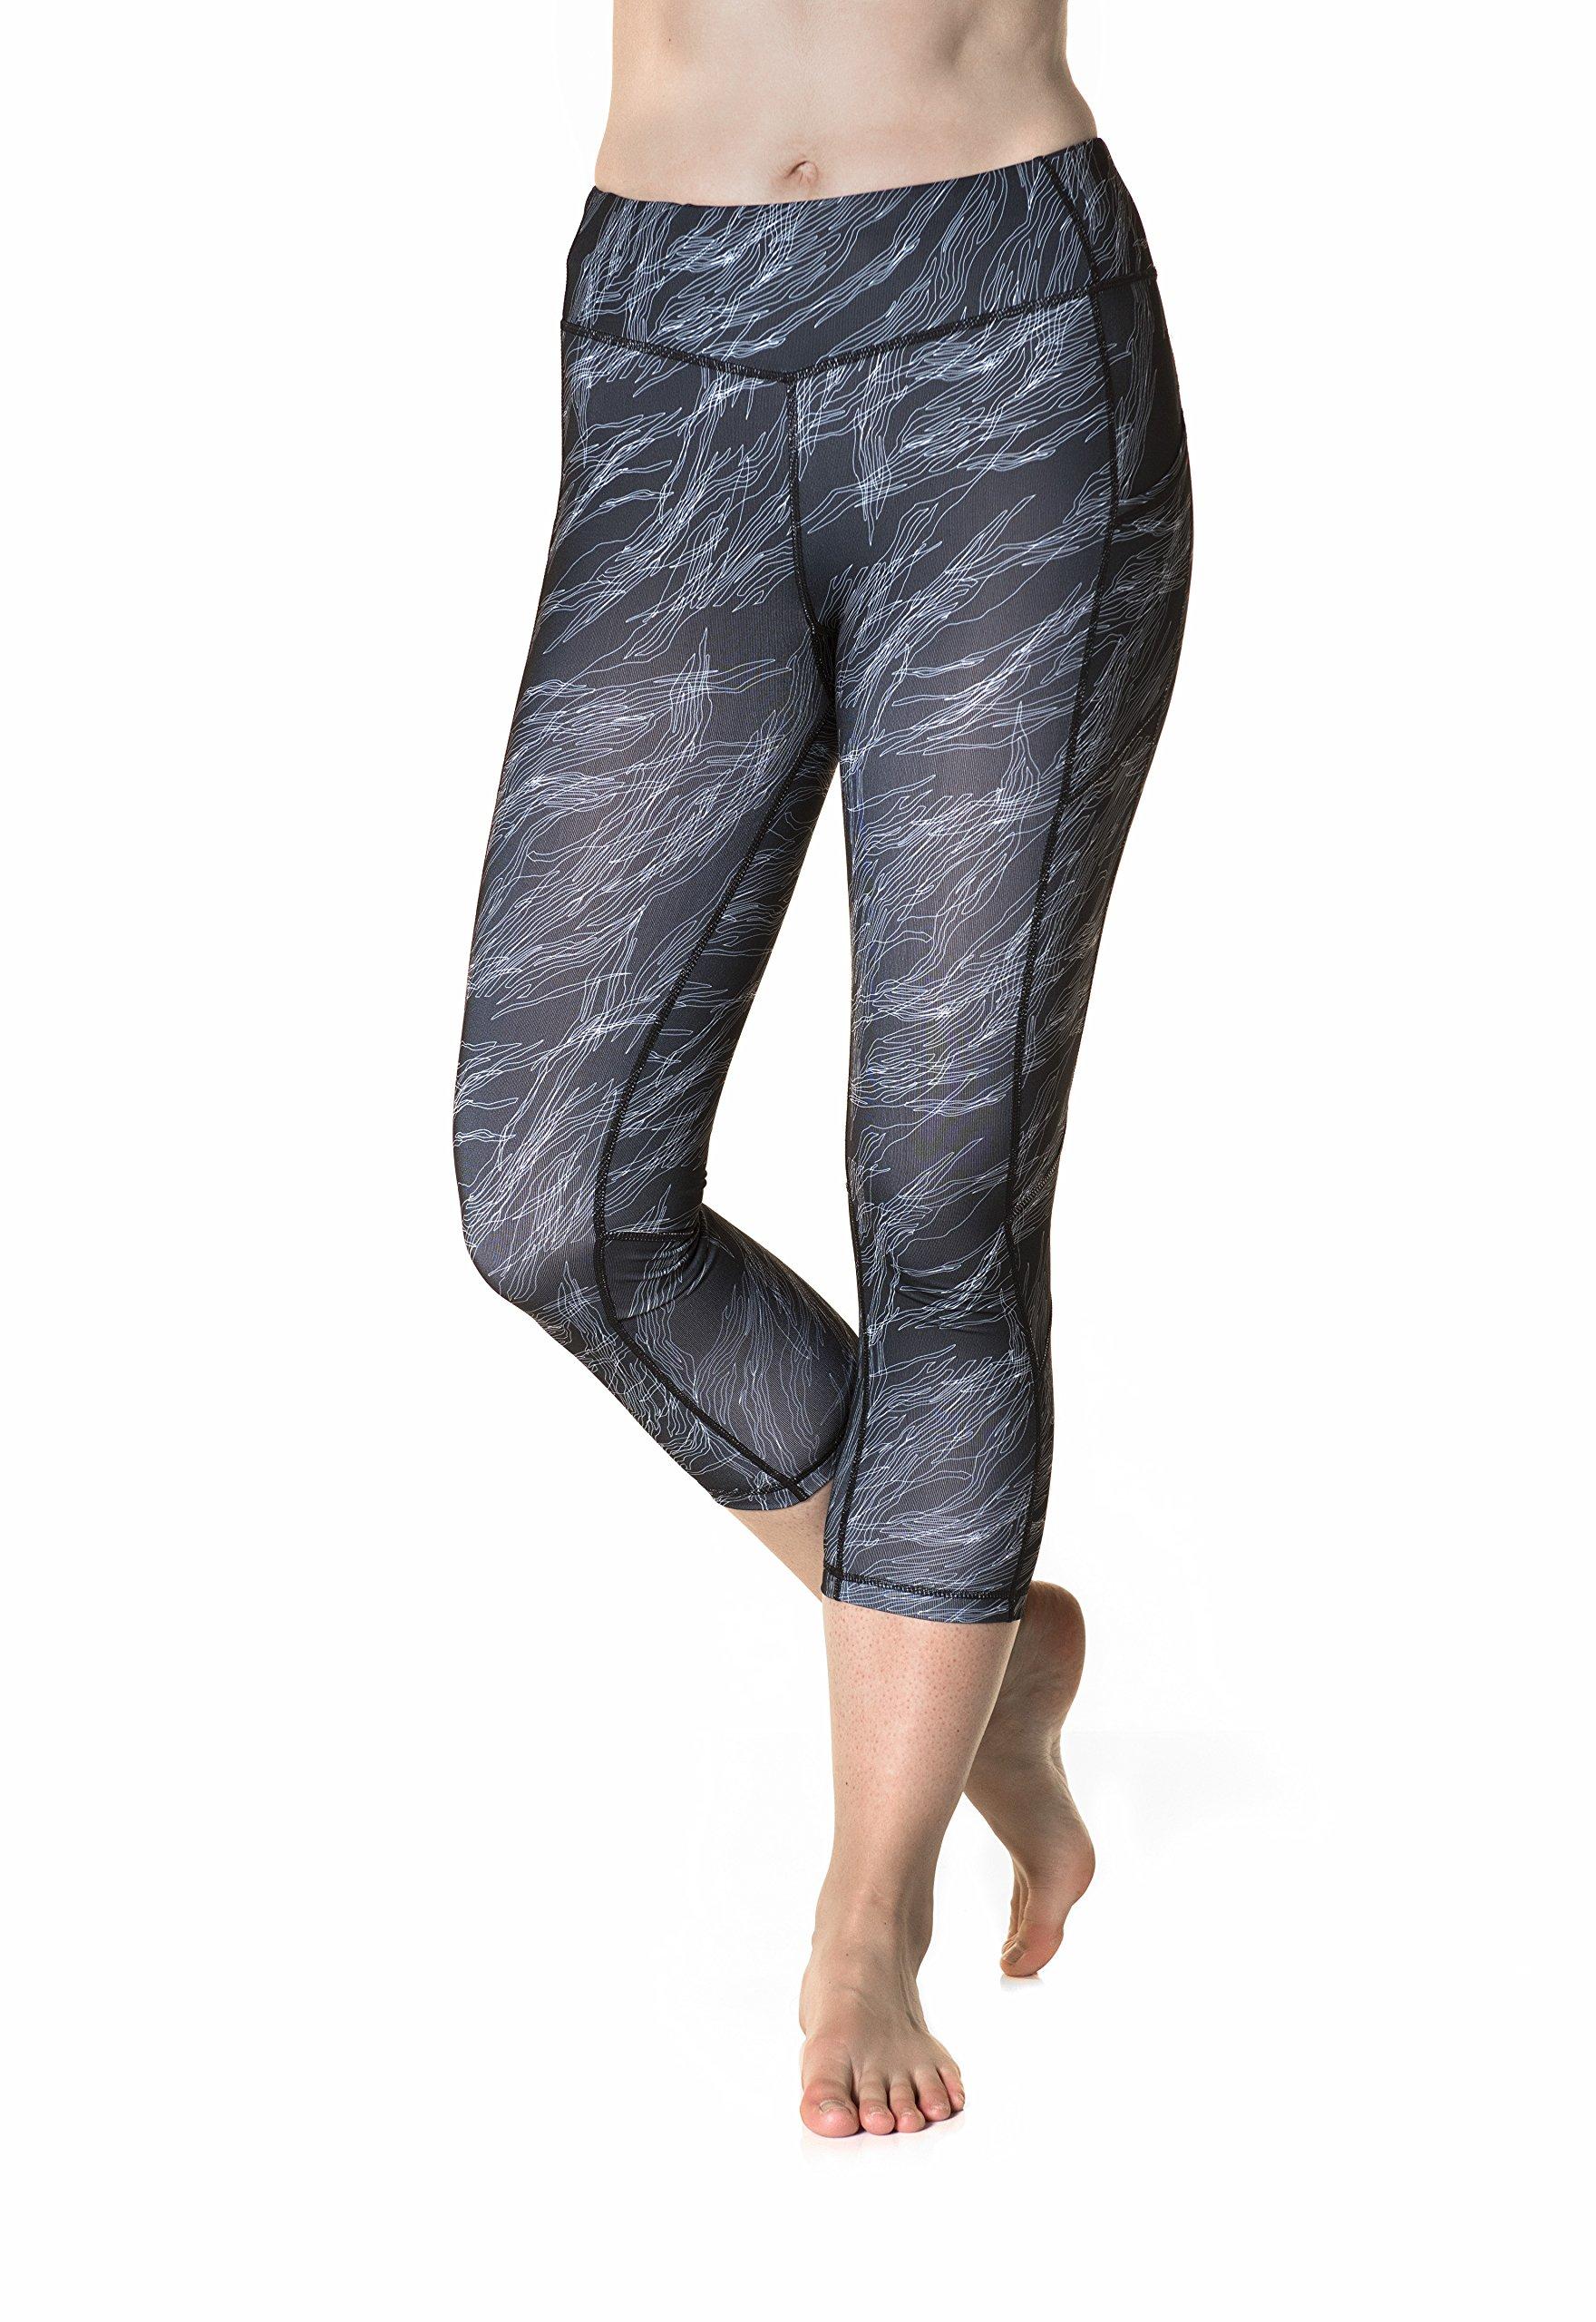 Skirt Sports Pocketopia Capri, Night Dive Print, X-Large by Skirt Sports